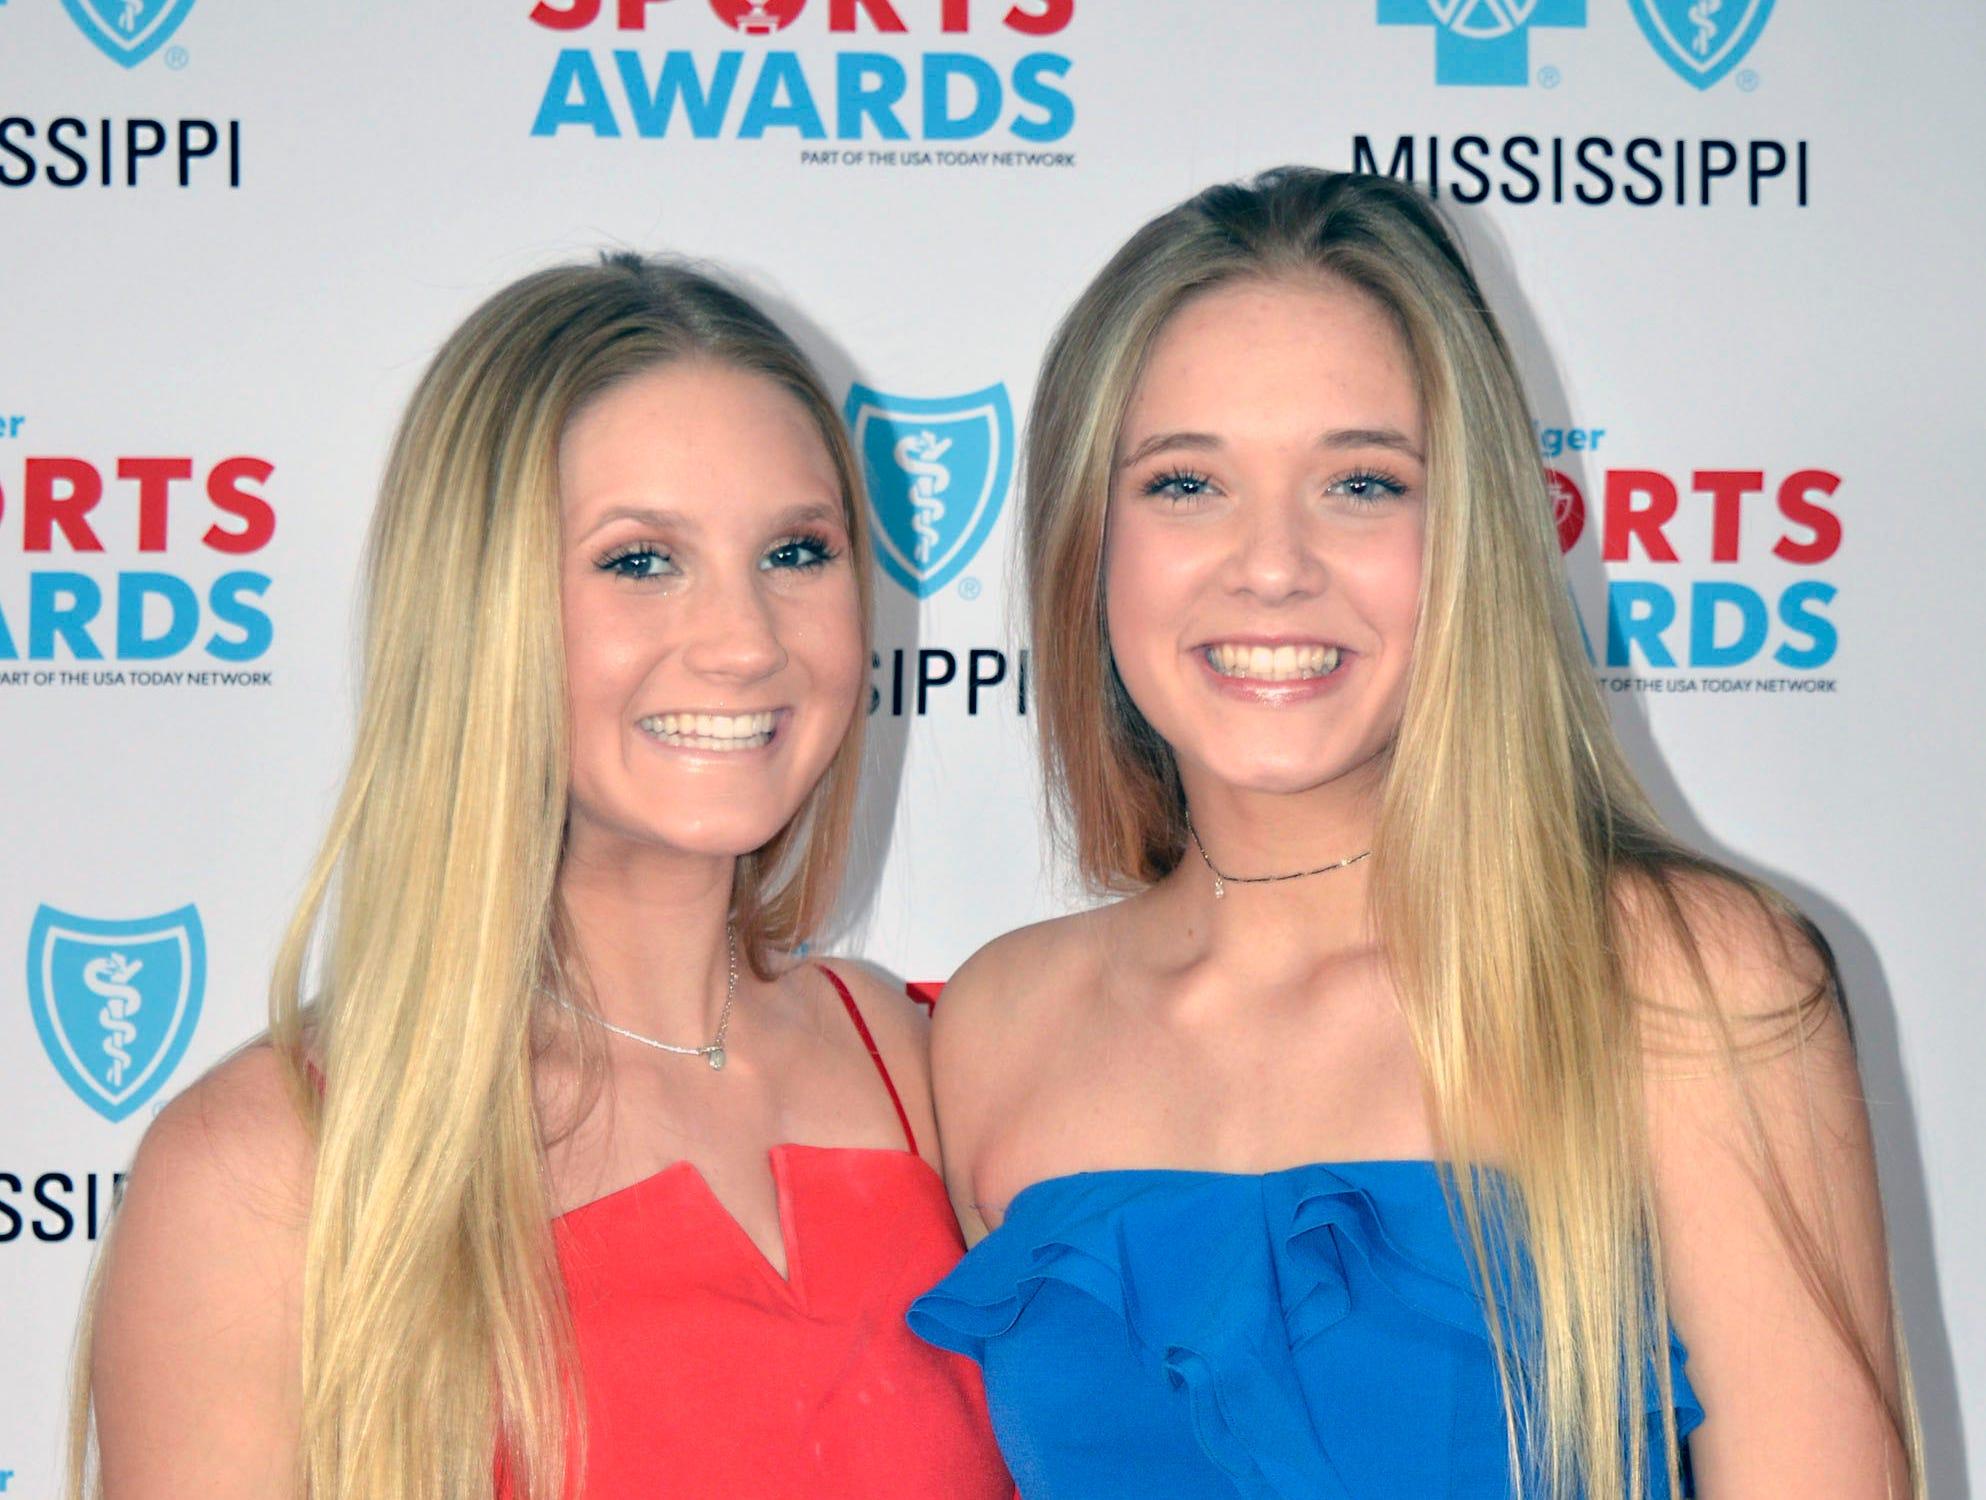 2109 Clarion Ledger Sport Awards at Thalia Mara Hall Tuesday, April 14, 2019.